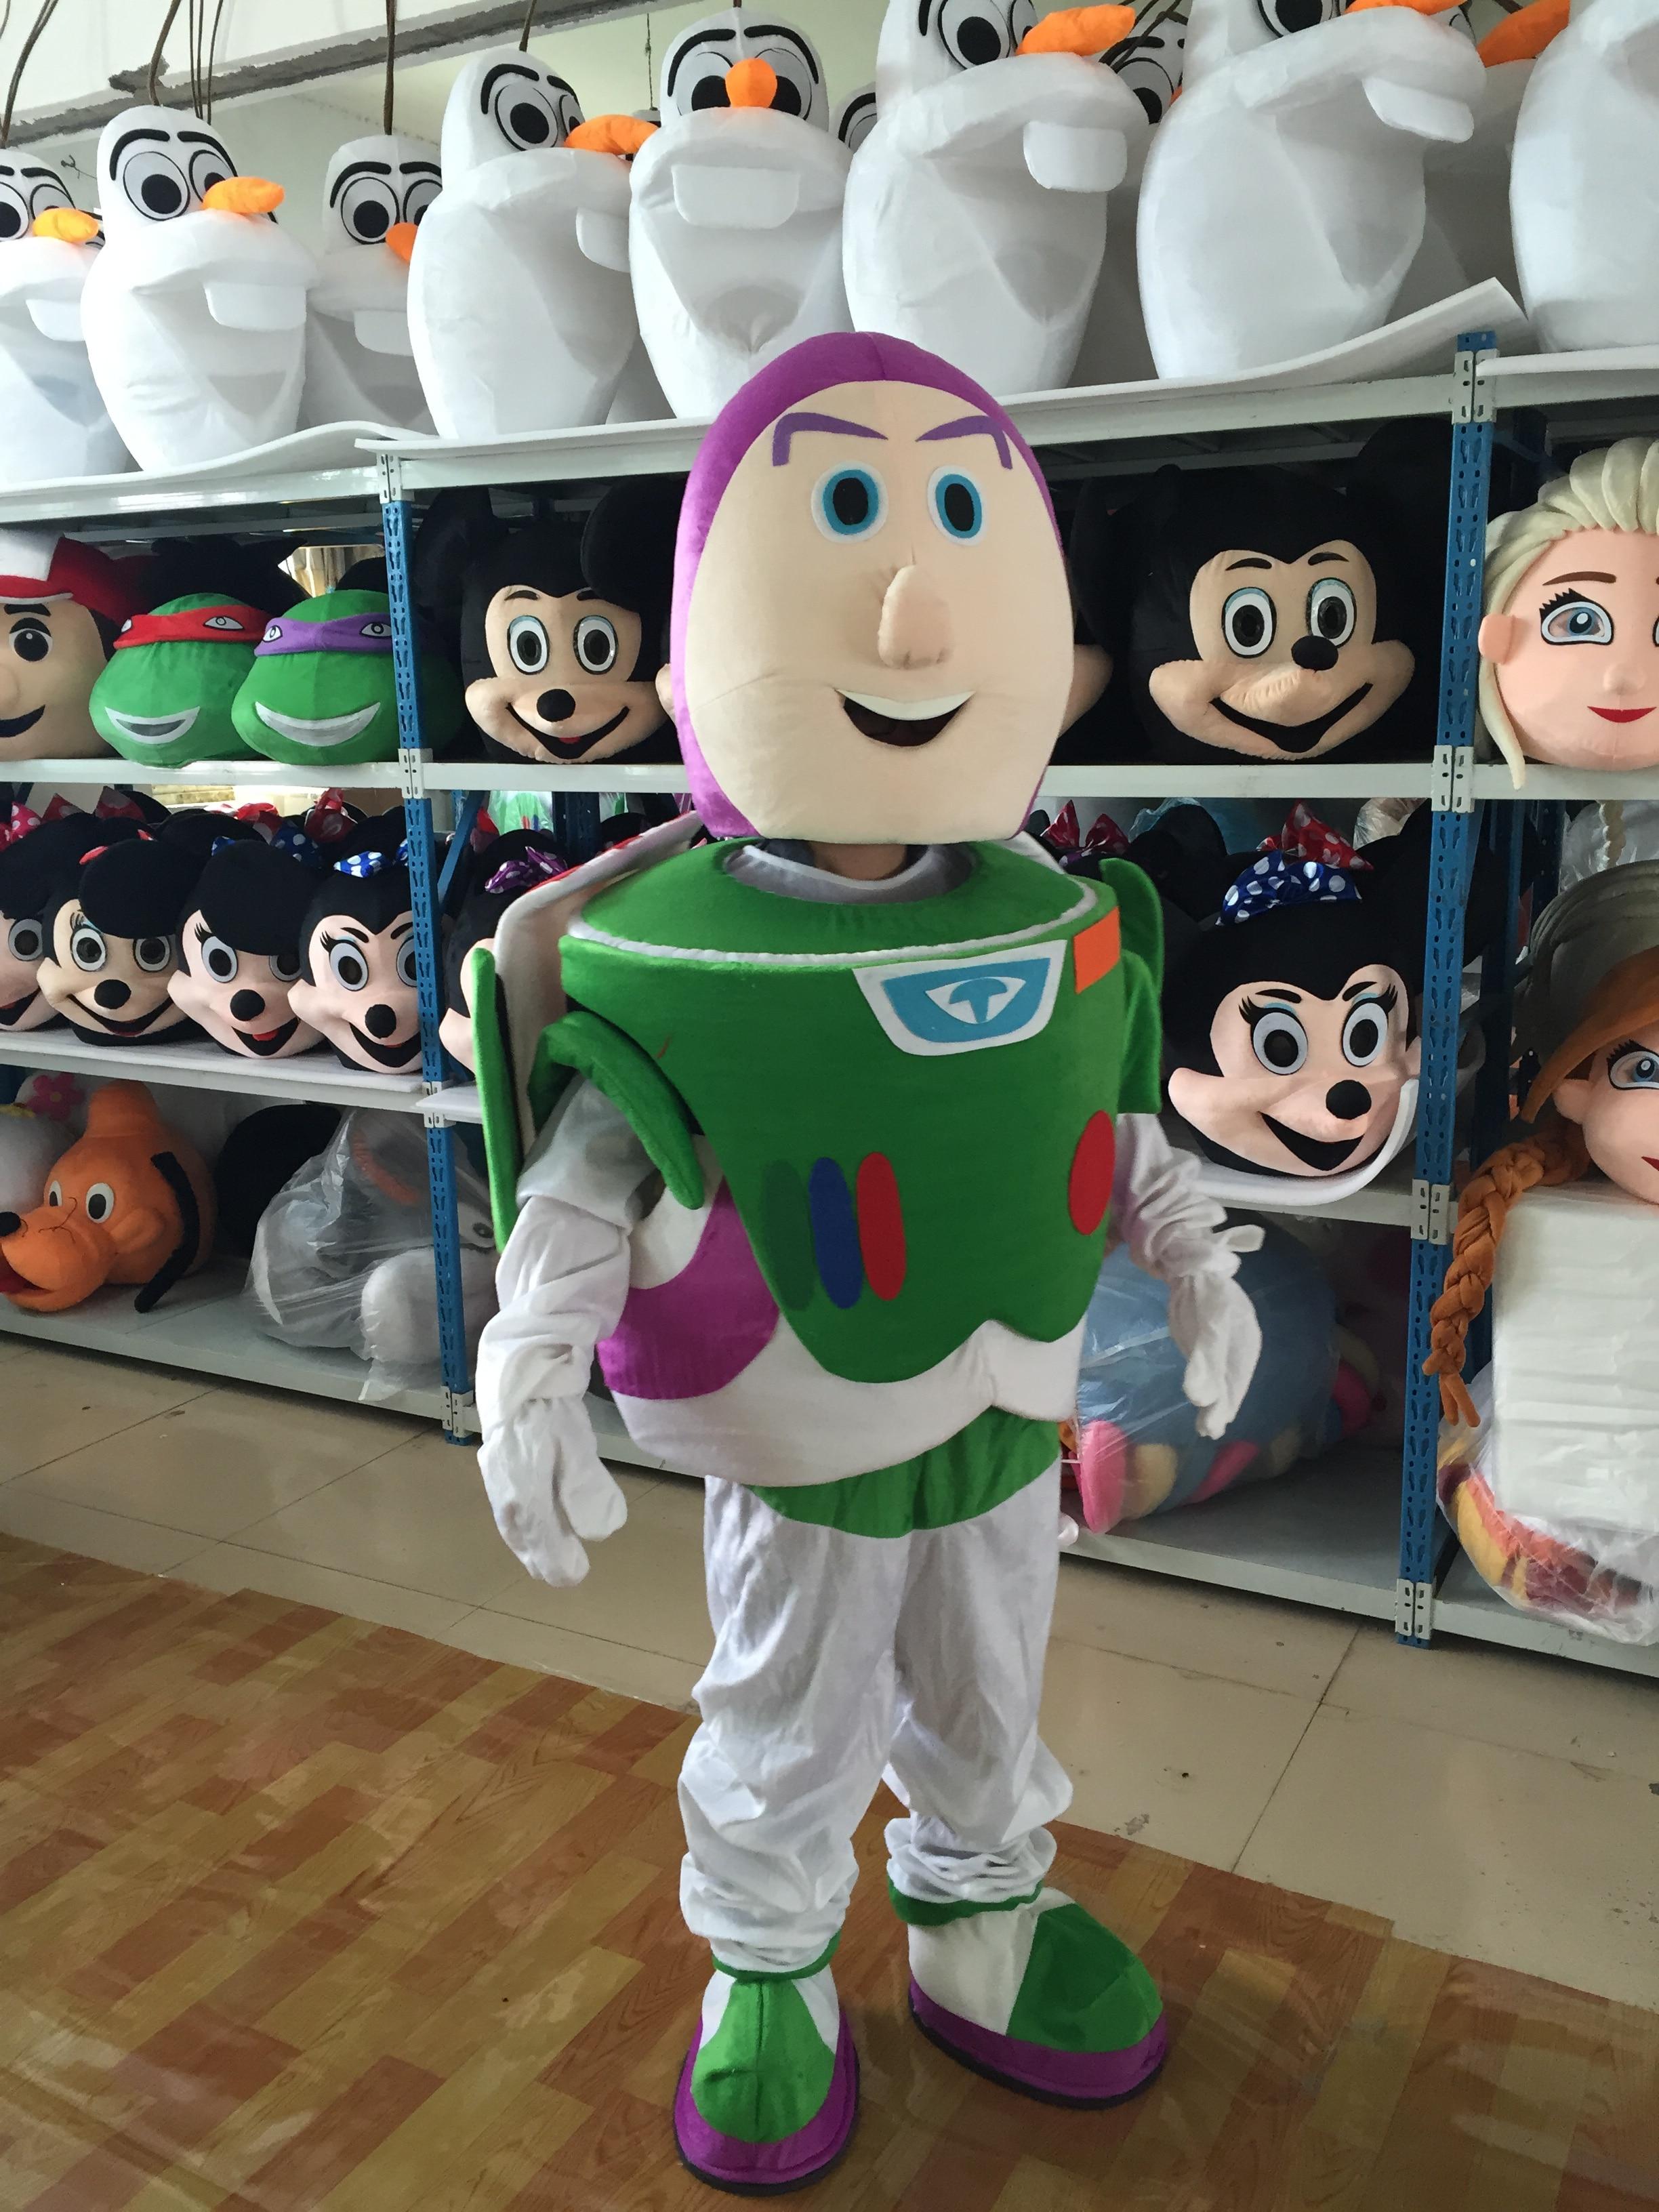 Buzz Lightyear dessin animé mascotte fantaisie fête robe mascotte Costume carnaval personnage Costume de noël cadeau Cosplay tenues adulte